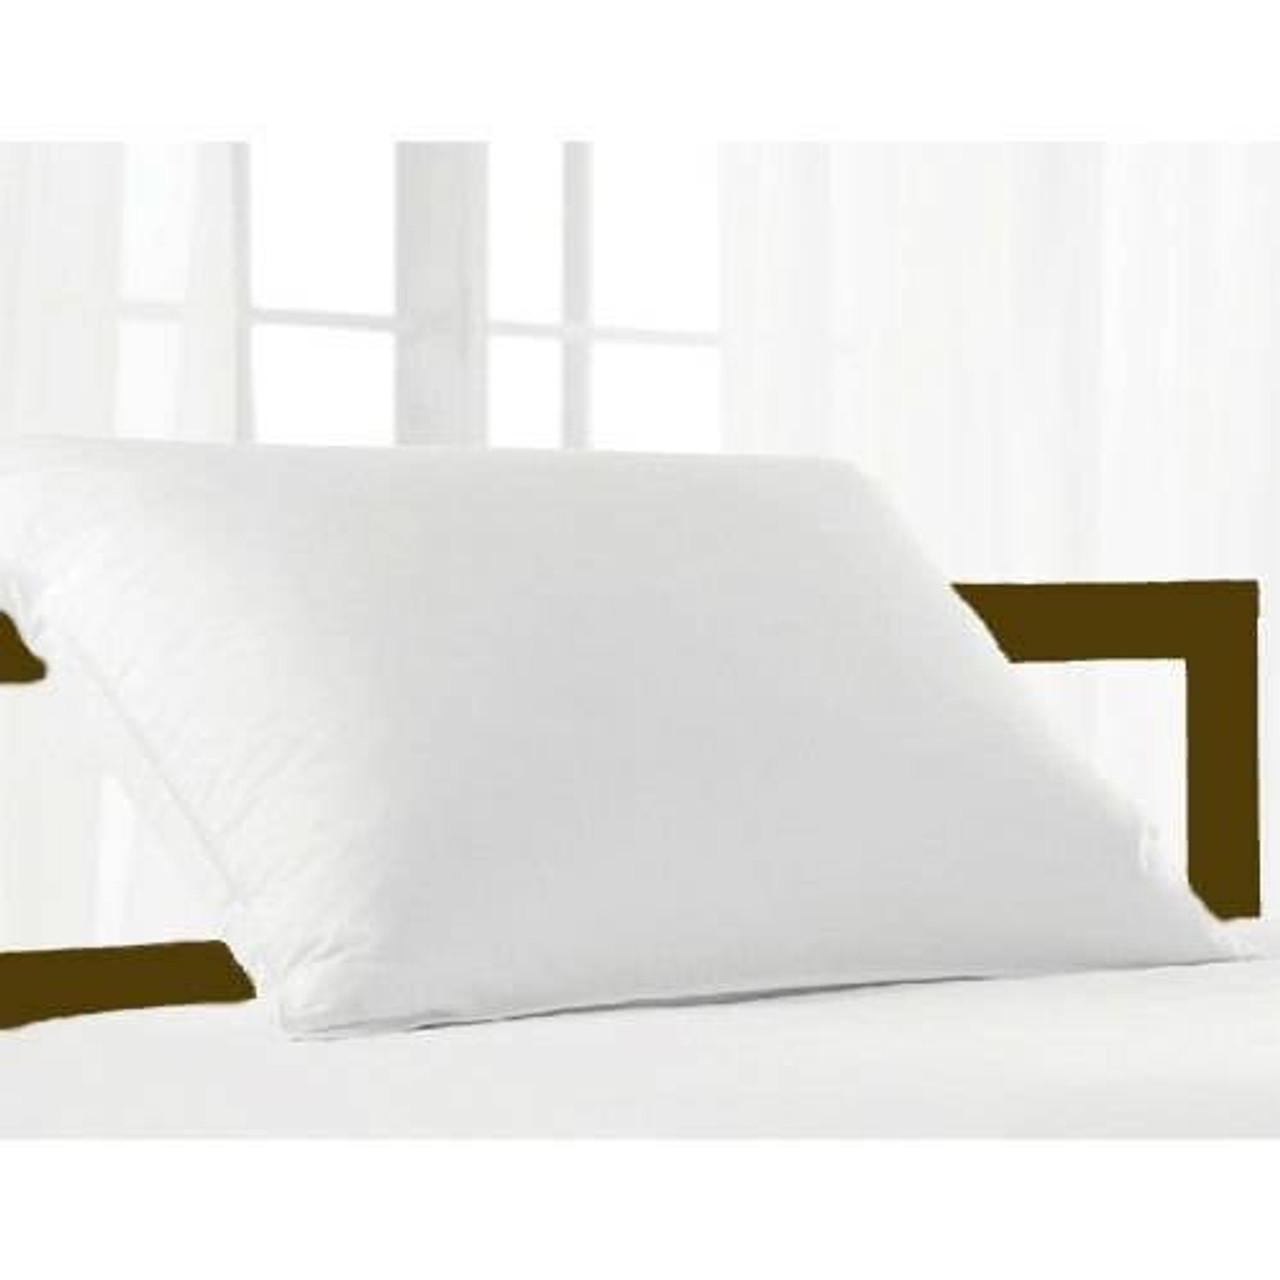 Restful Nights Restful Nights Pillows or Everlasting Loft